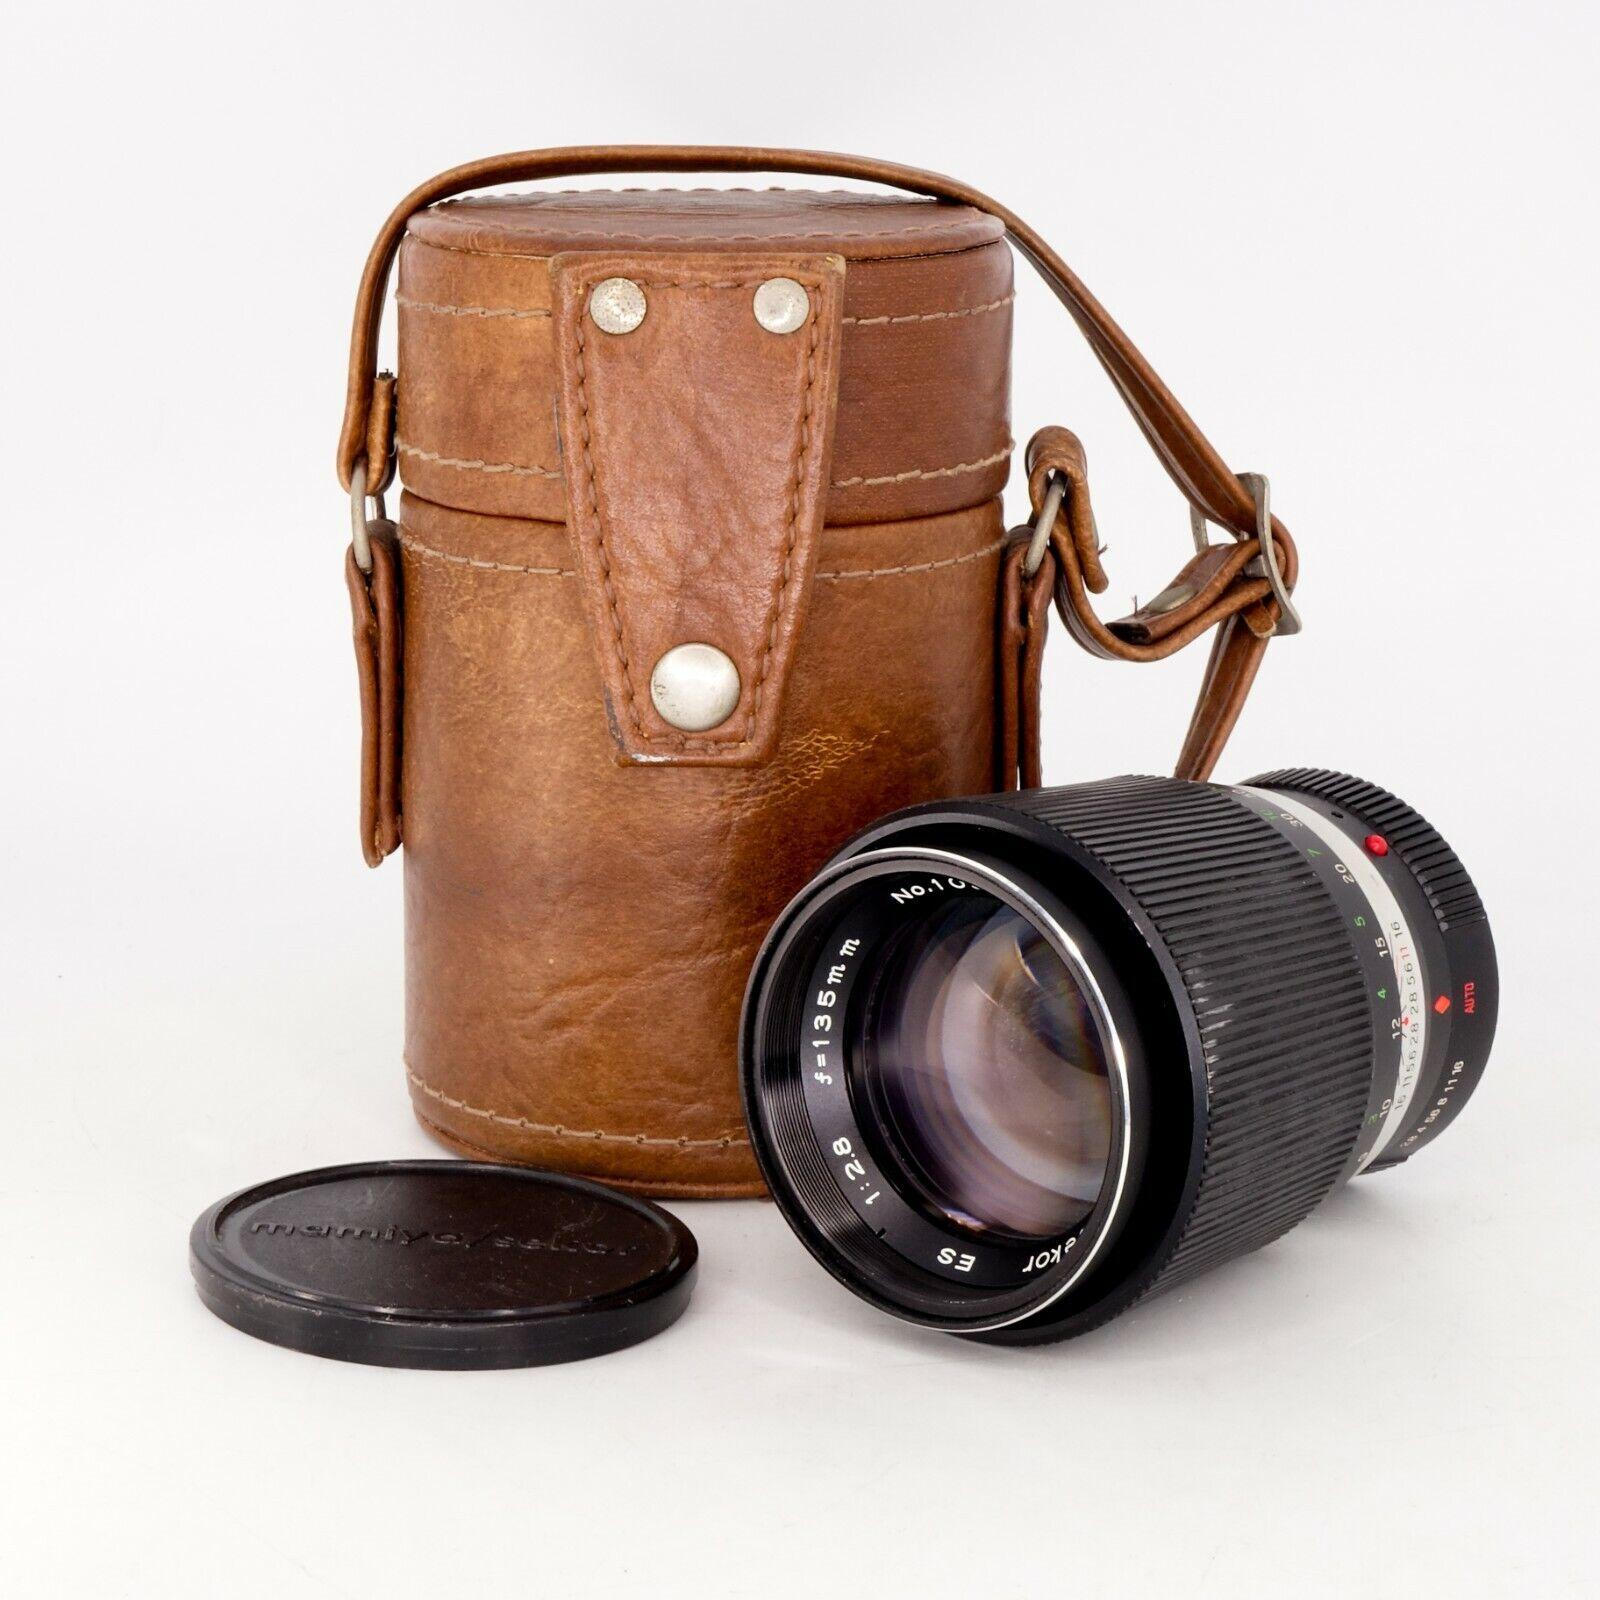 Mamiya Sekor C 645 Rear lens Cap for 80mm f2.8 645 Pro TL Genuine OEM